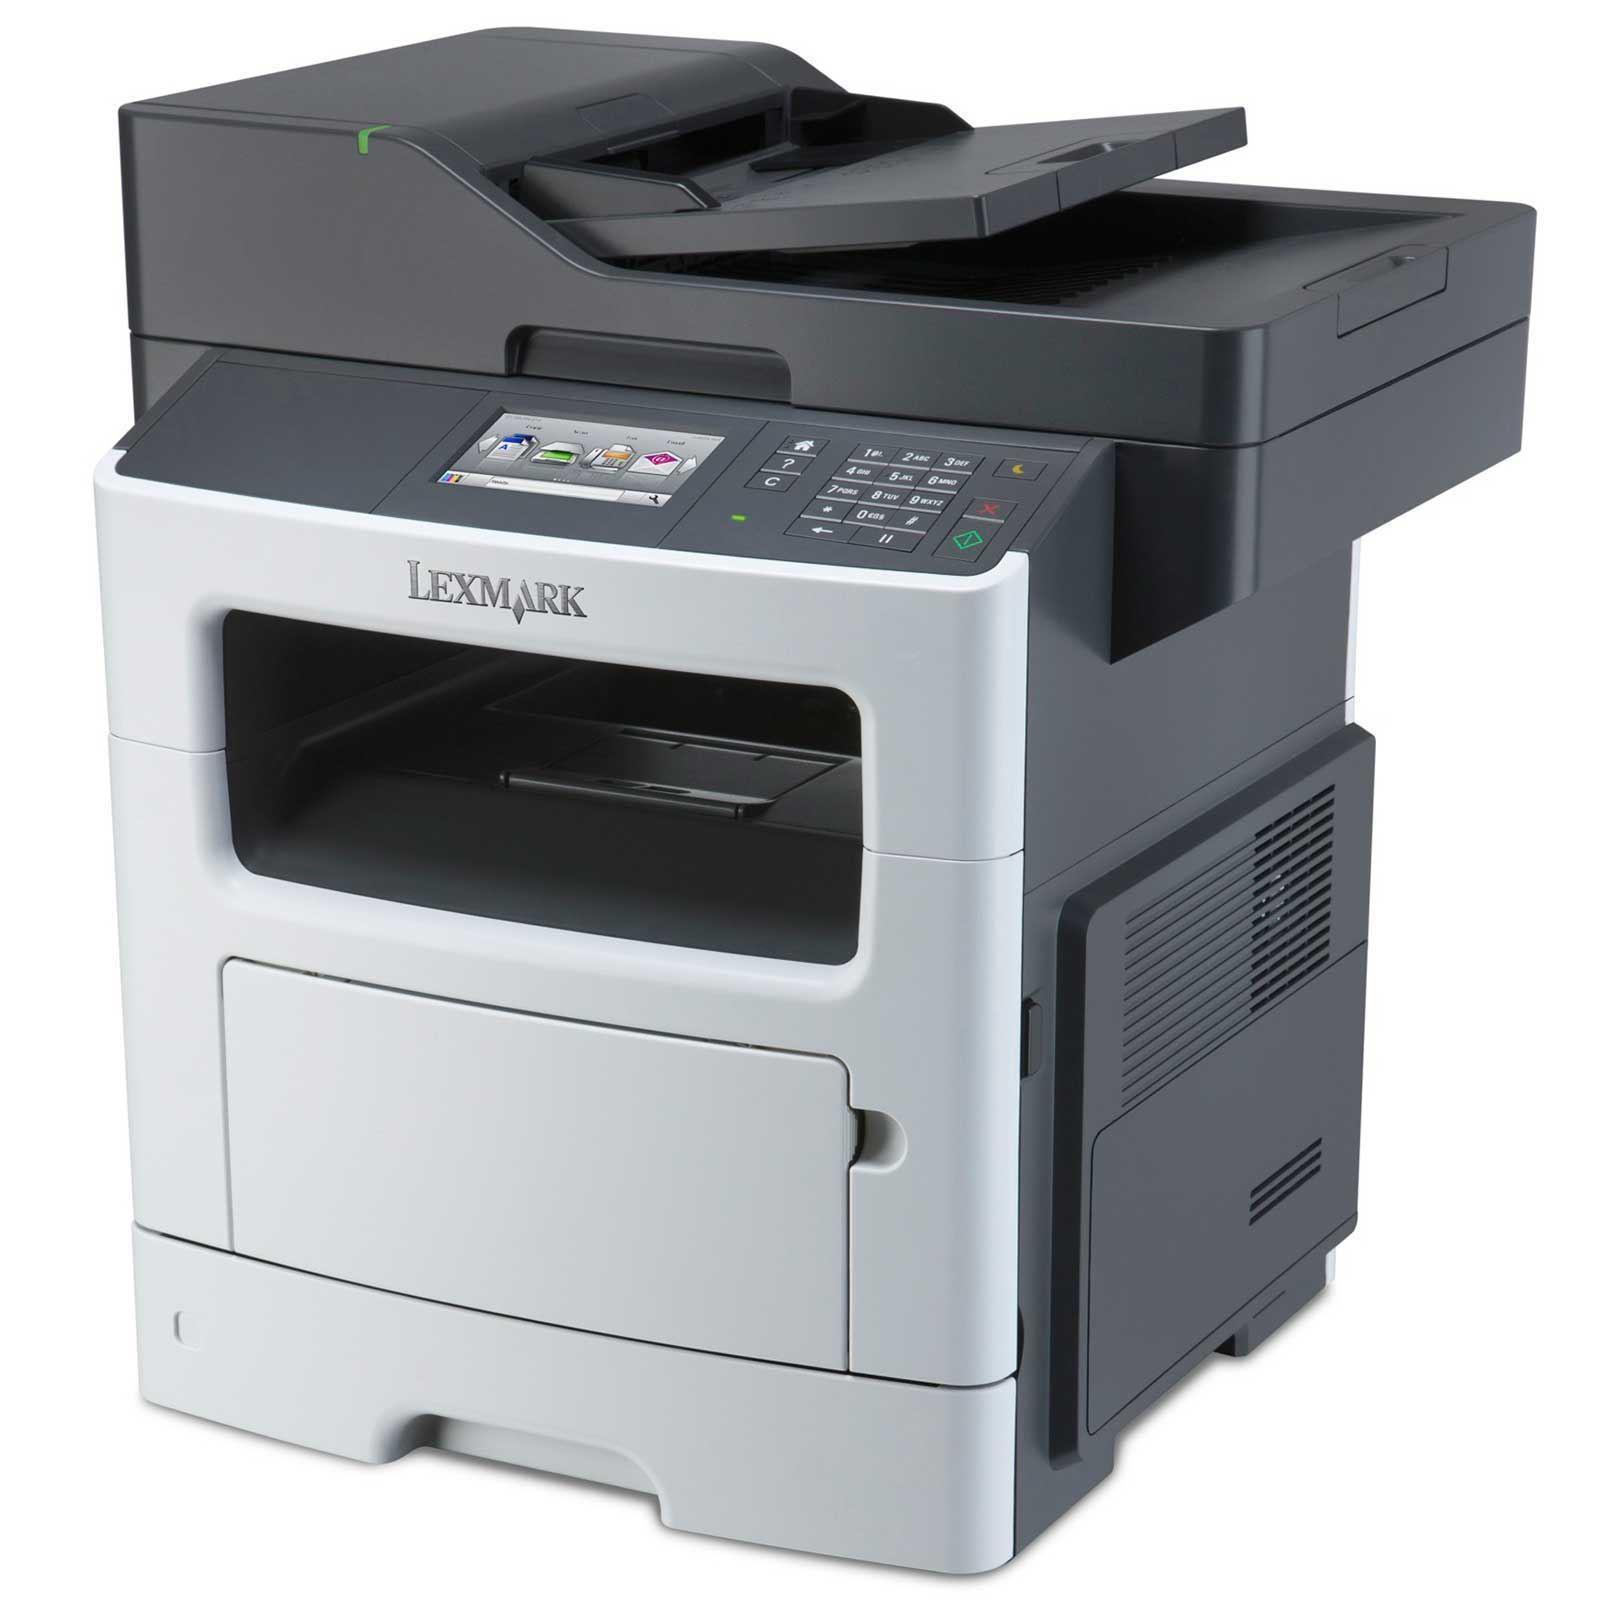 Lexmark MX511DHE Multifunction Printer